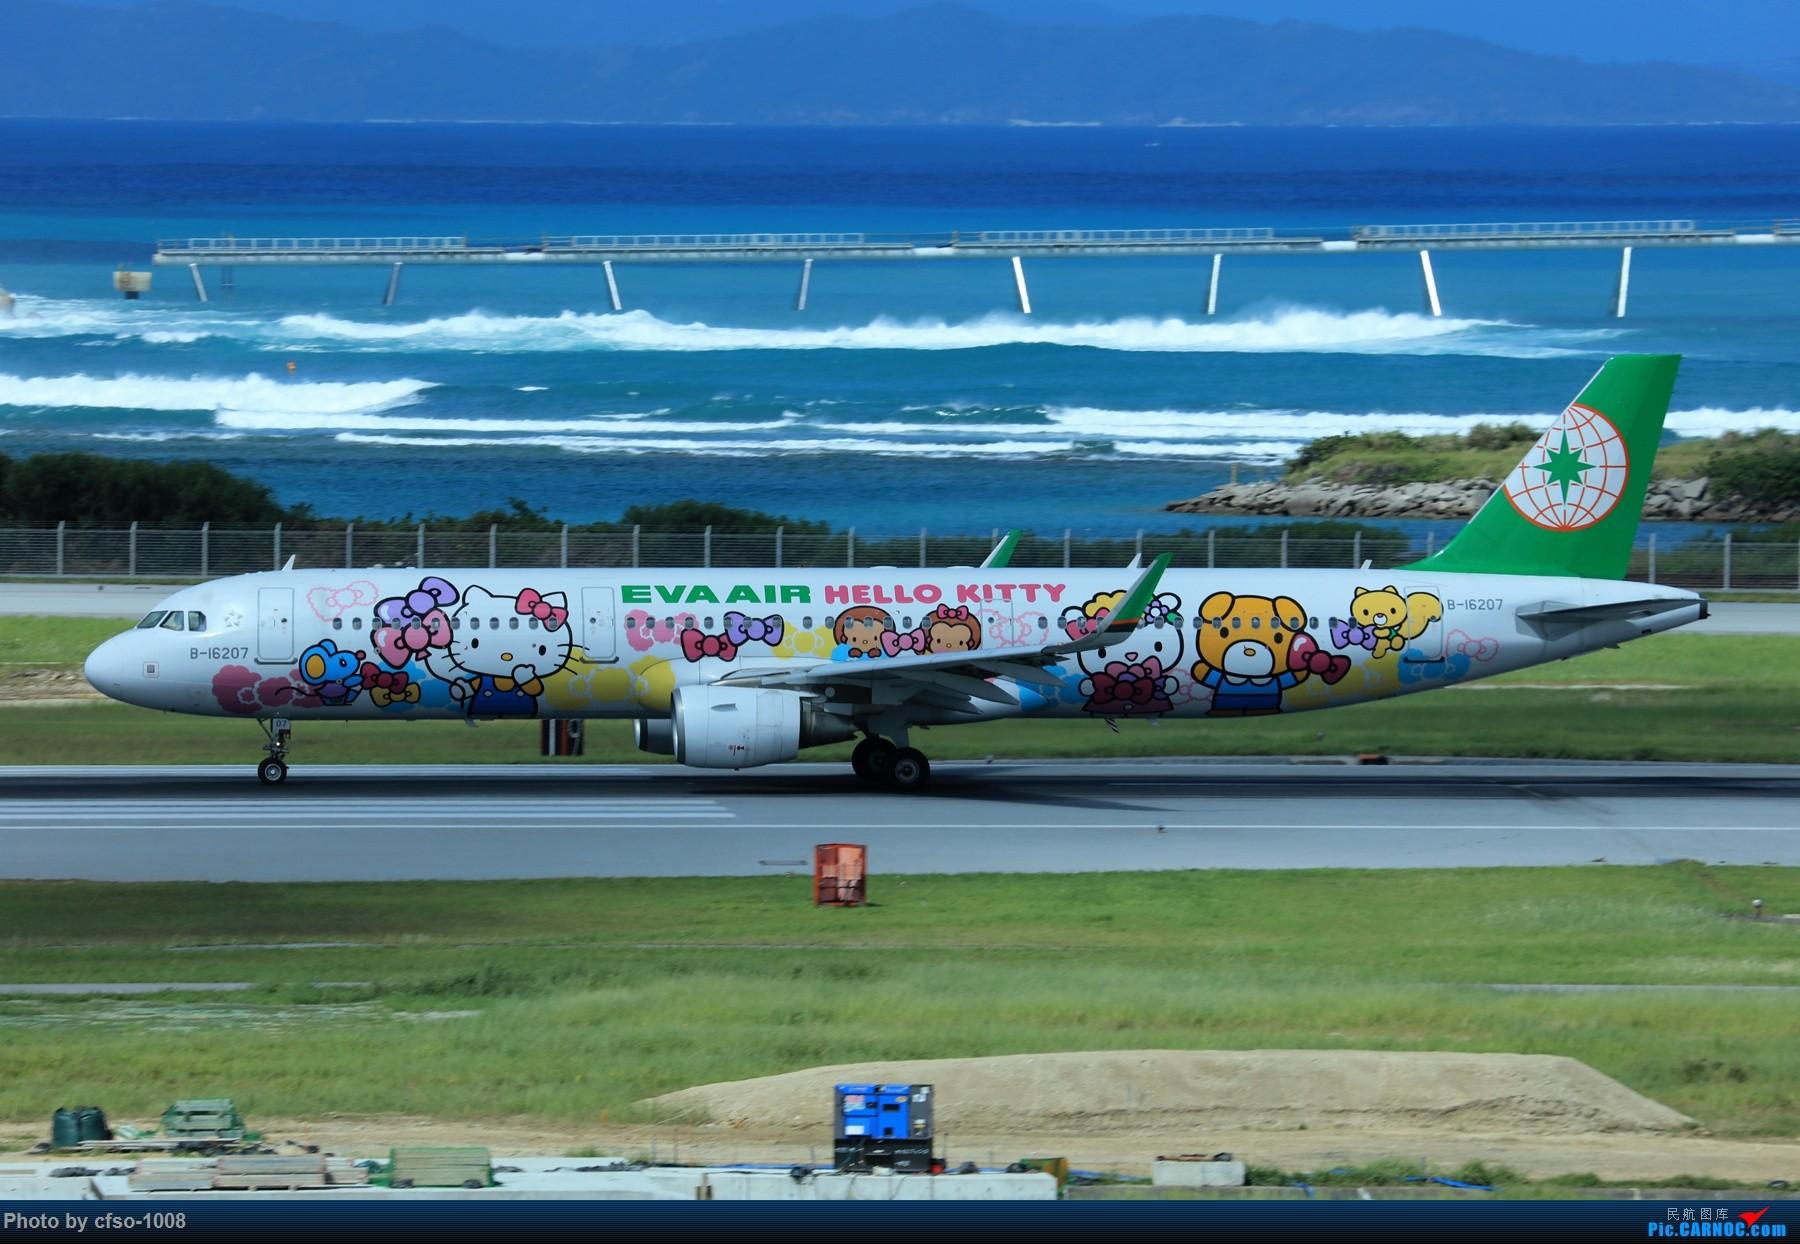 Re:解锁新机场,冲绳那霸机场拍机 AIRBUS A321-200 B-16207 日本那霸机场